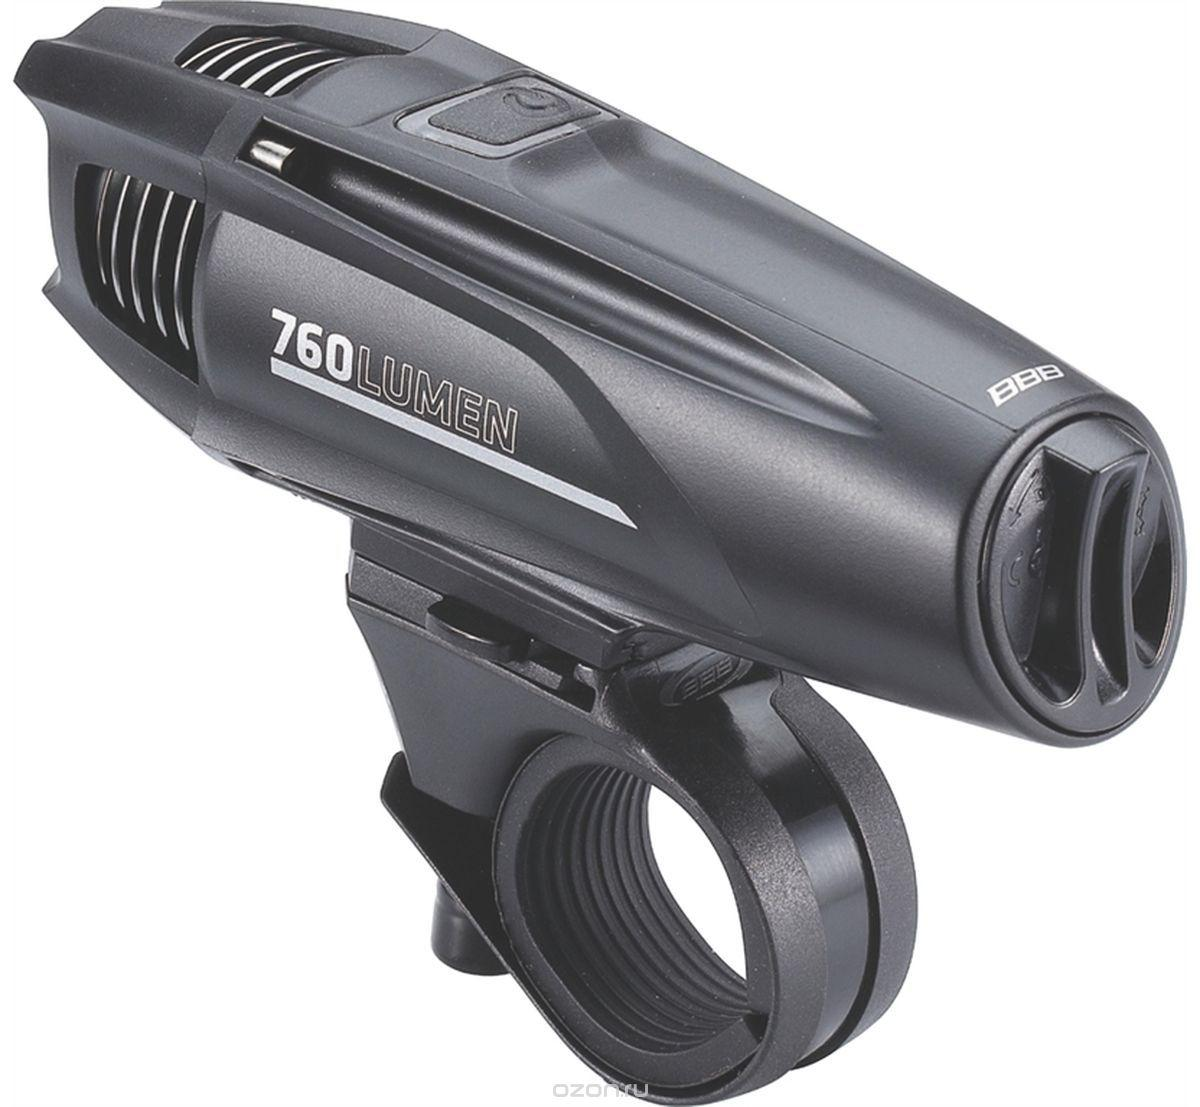 "Фара передн. BBB BLS-74 ""Strike"" 760 lumen 2600mAh акумул. черн. (8716683100709)"